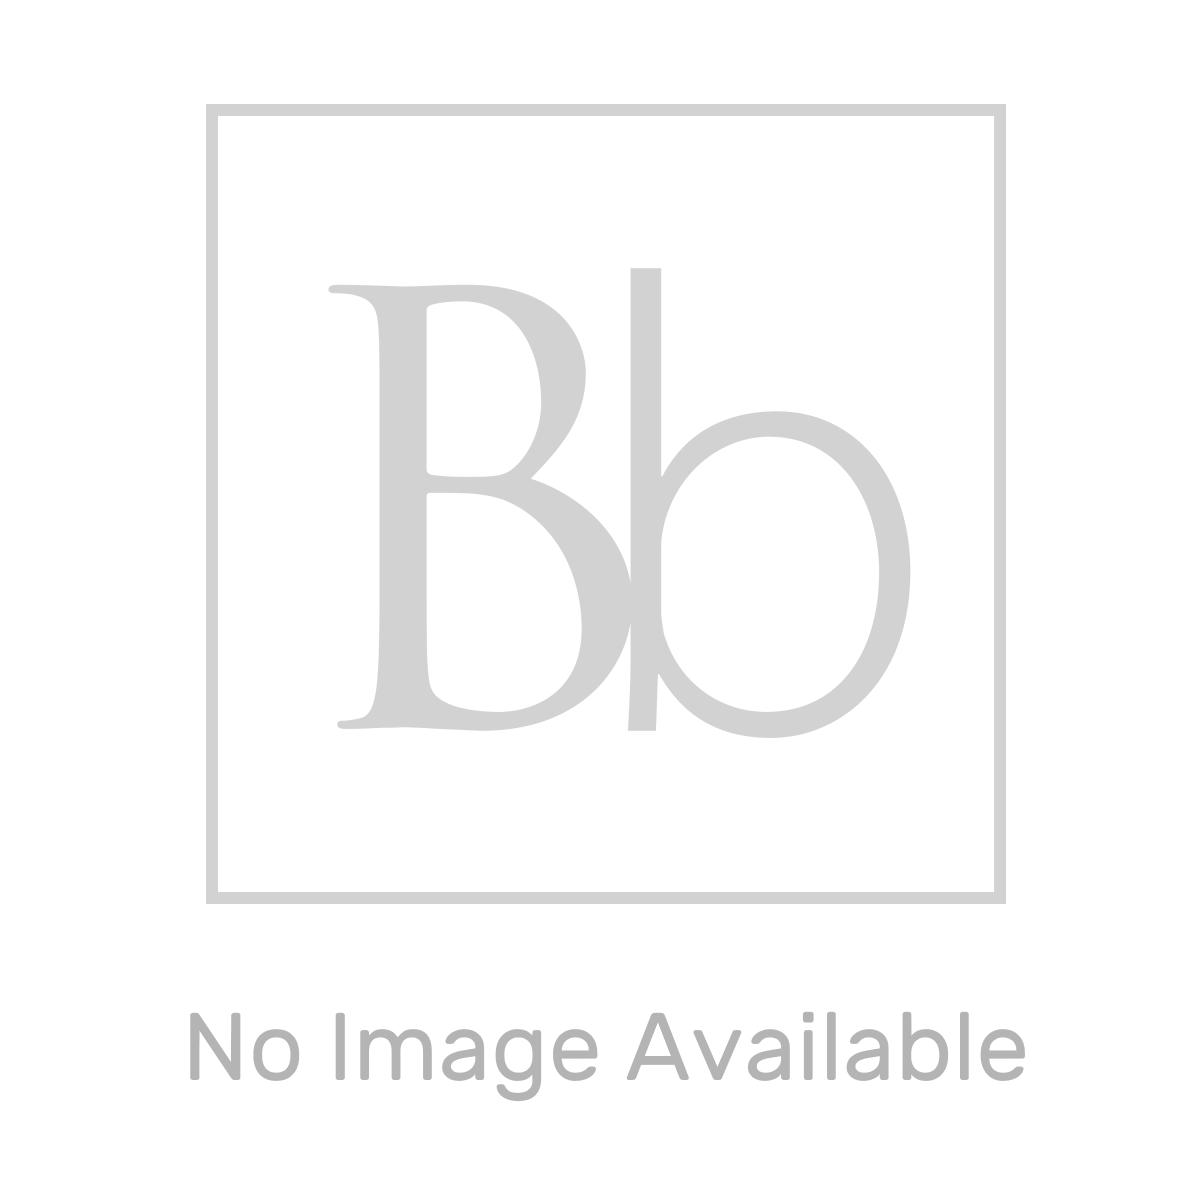 RAK Cubis Soap Dispenser and Holder